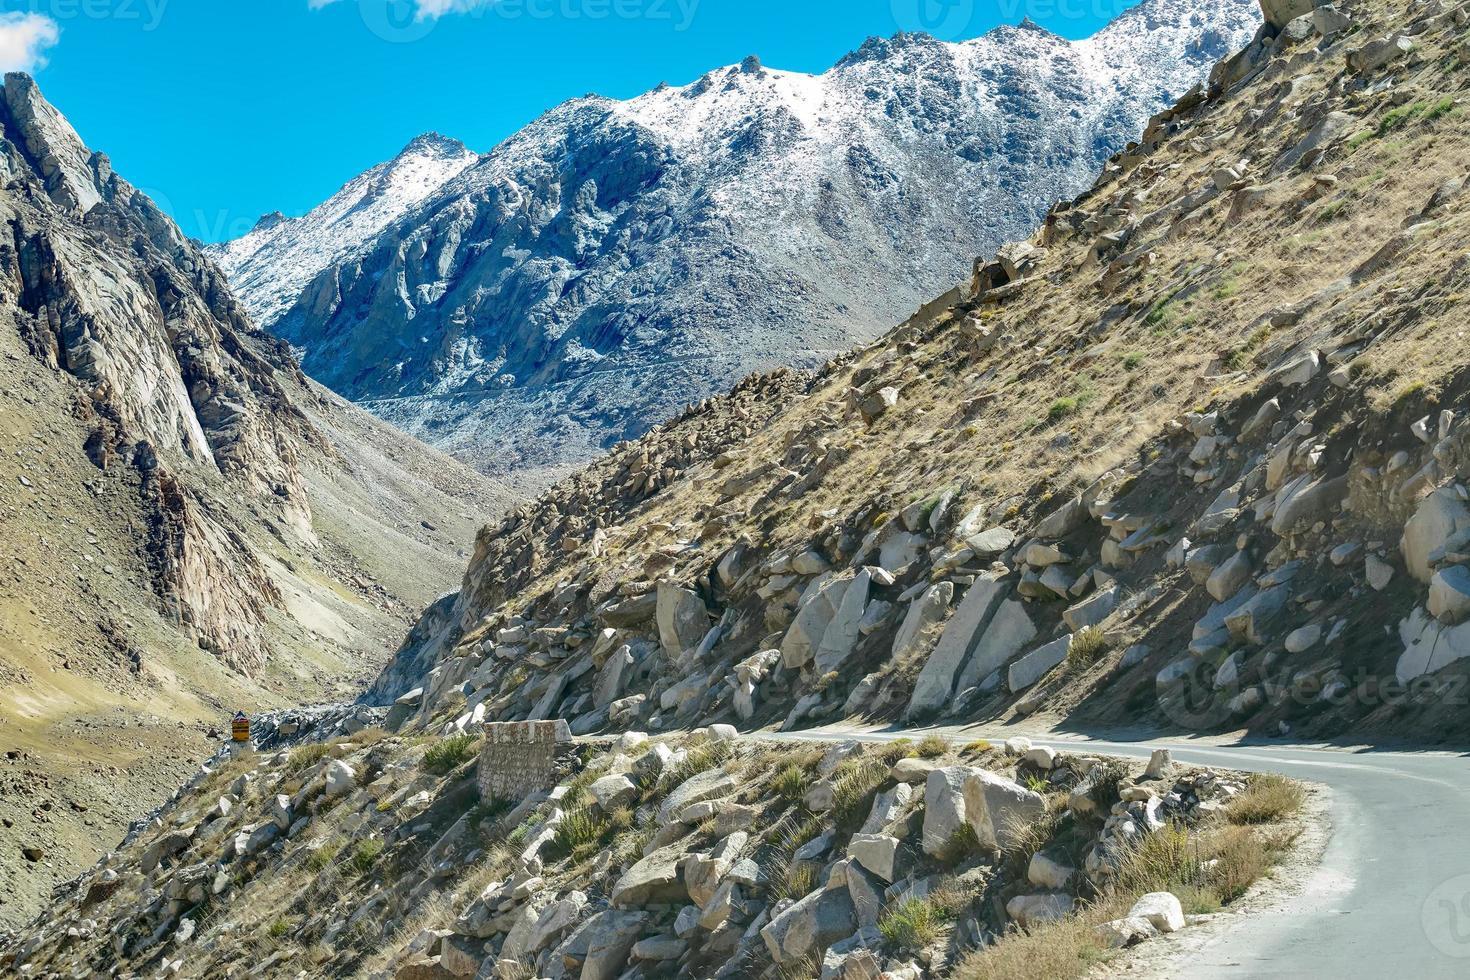 Road, Mountains of Leh, Ladakh, Jammu and Kashmir, India photo